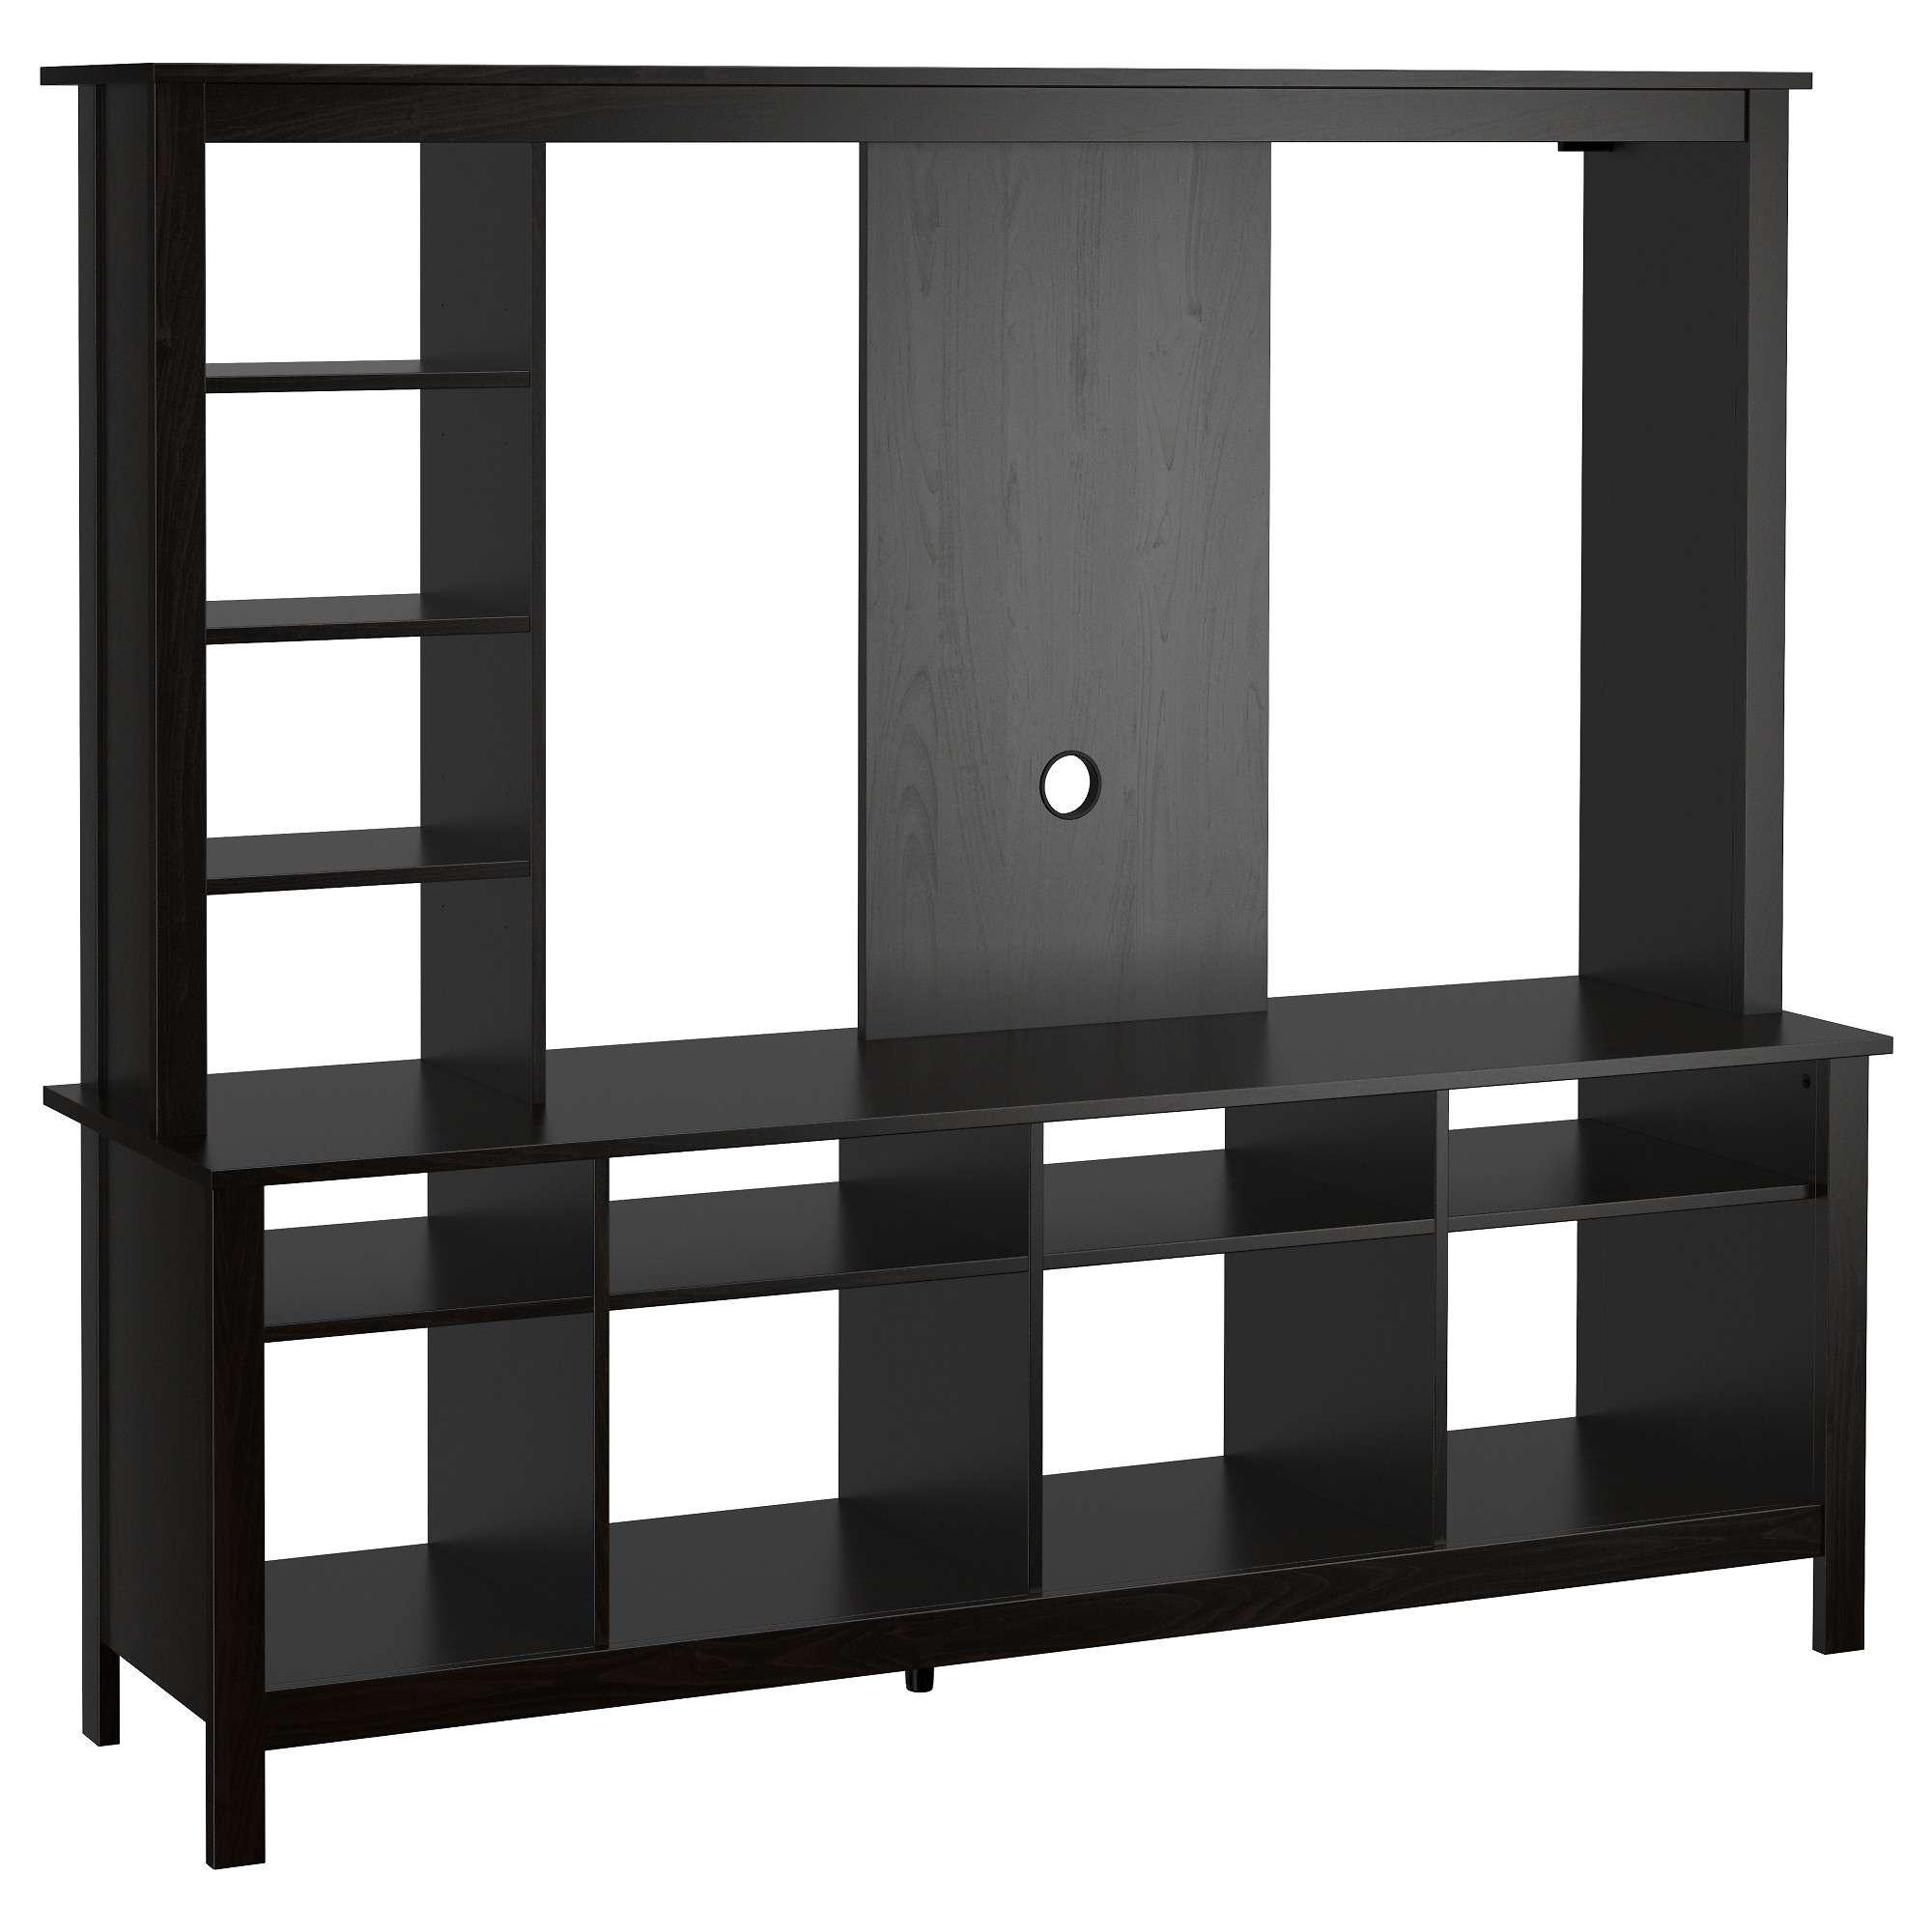 Tomnäs Tv Storage Unit – Black Brown – Ikea For Storage Tv Stands (View 7 of 15)